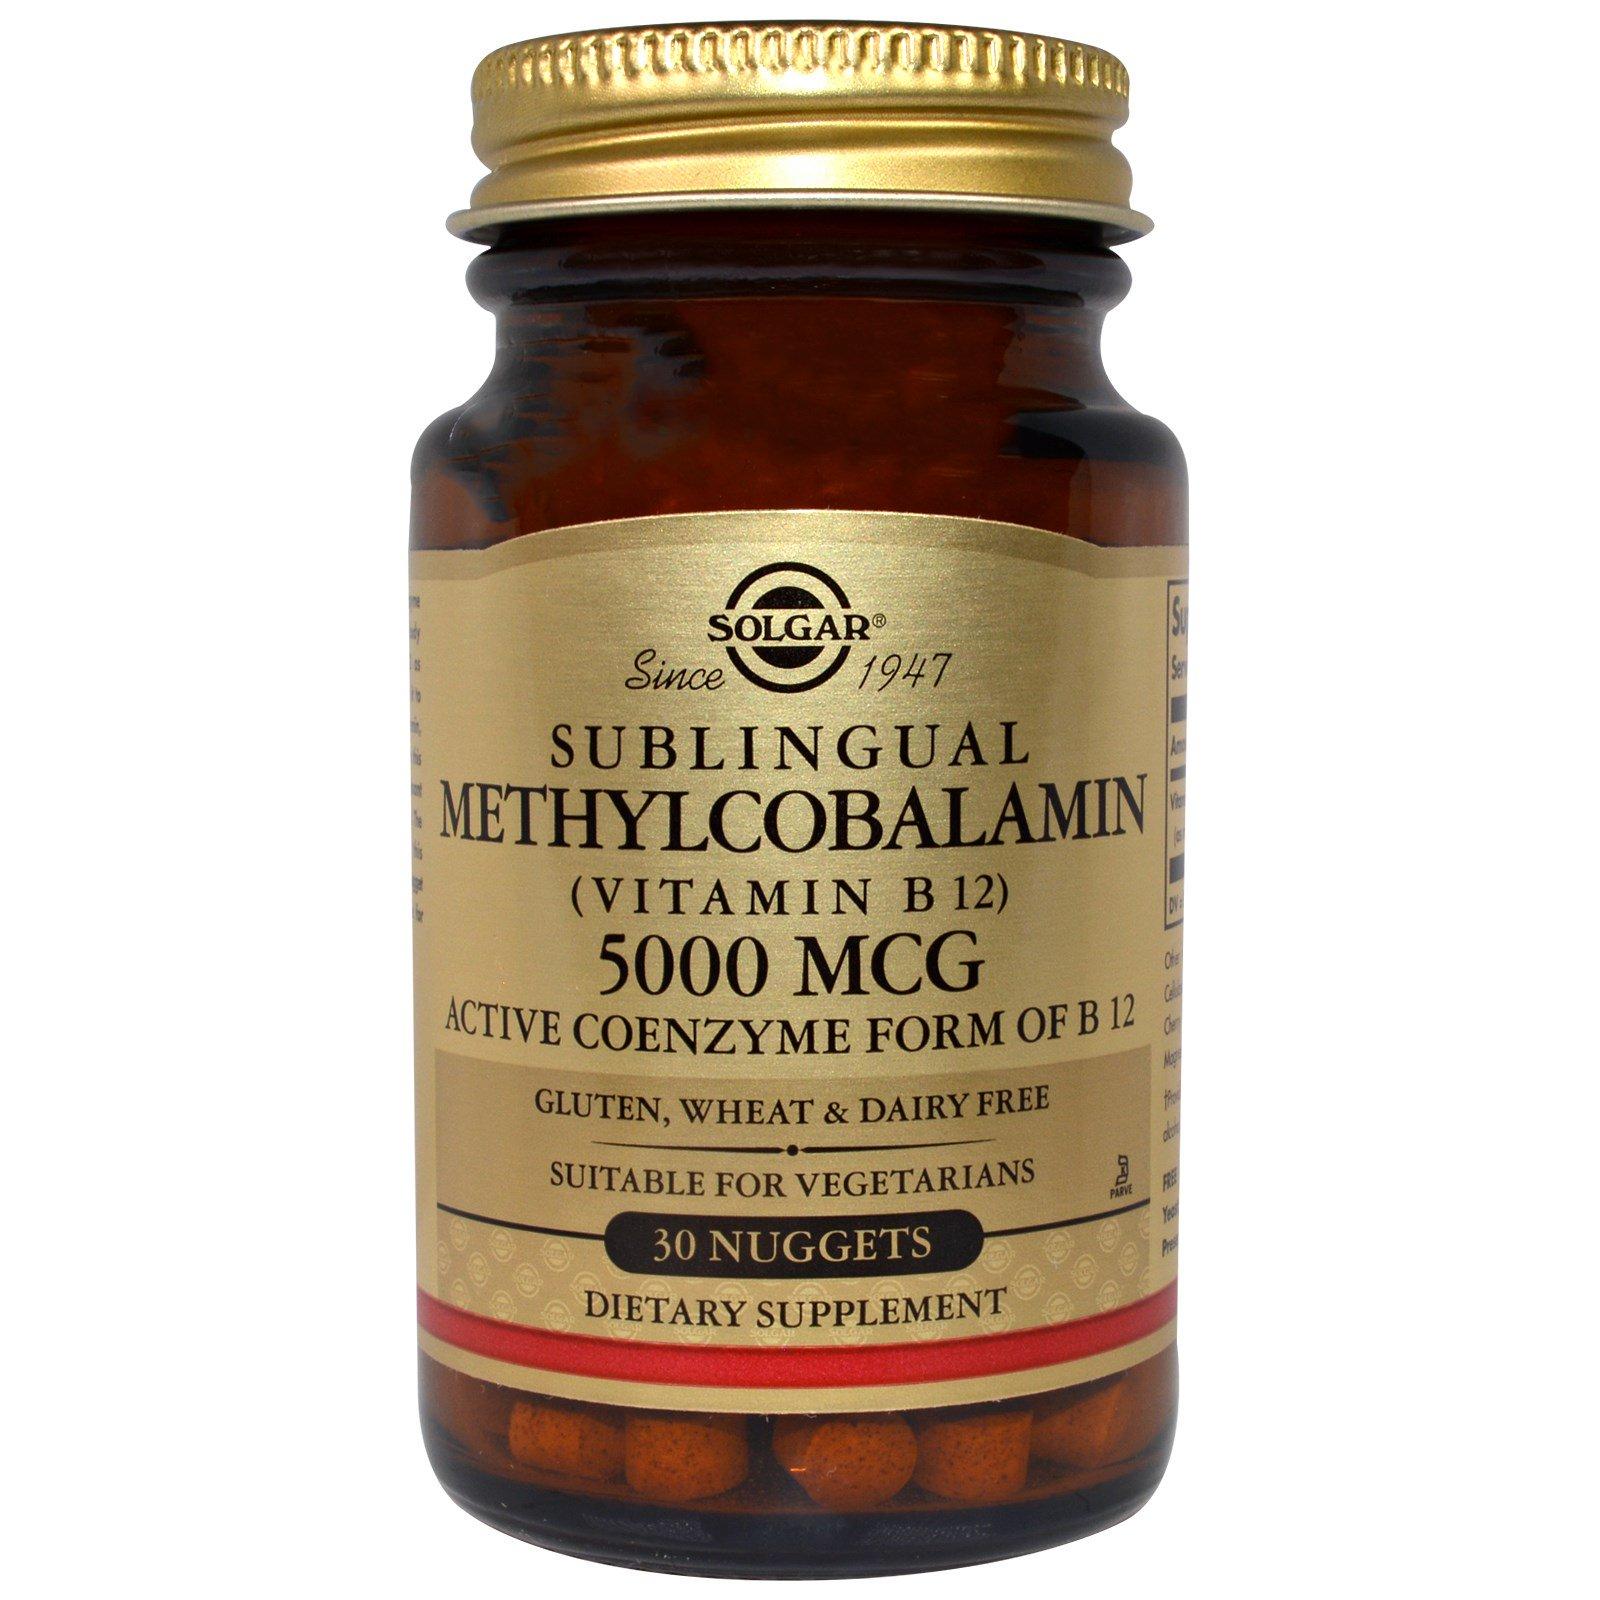 Solgar Methylcobalamin (Vitamin B12) 5000 mcg 30 ...